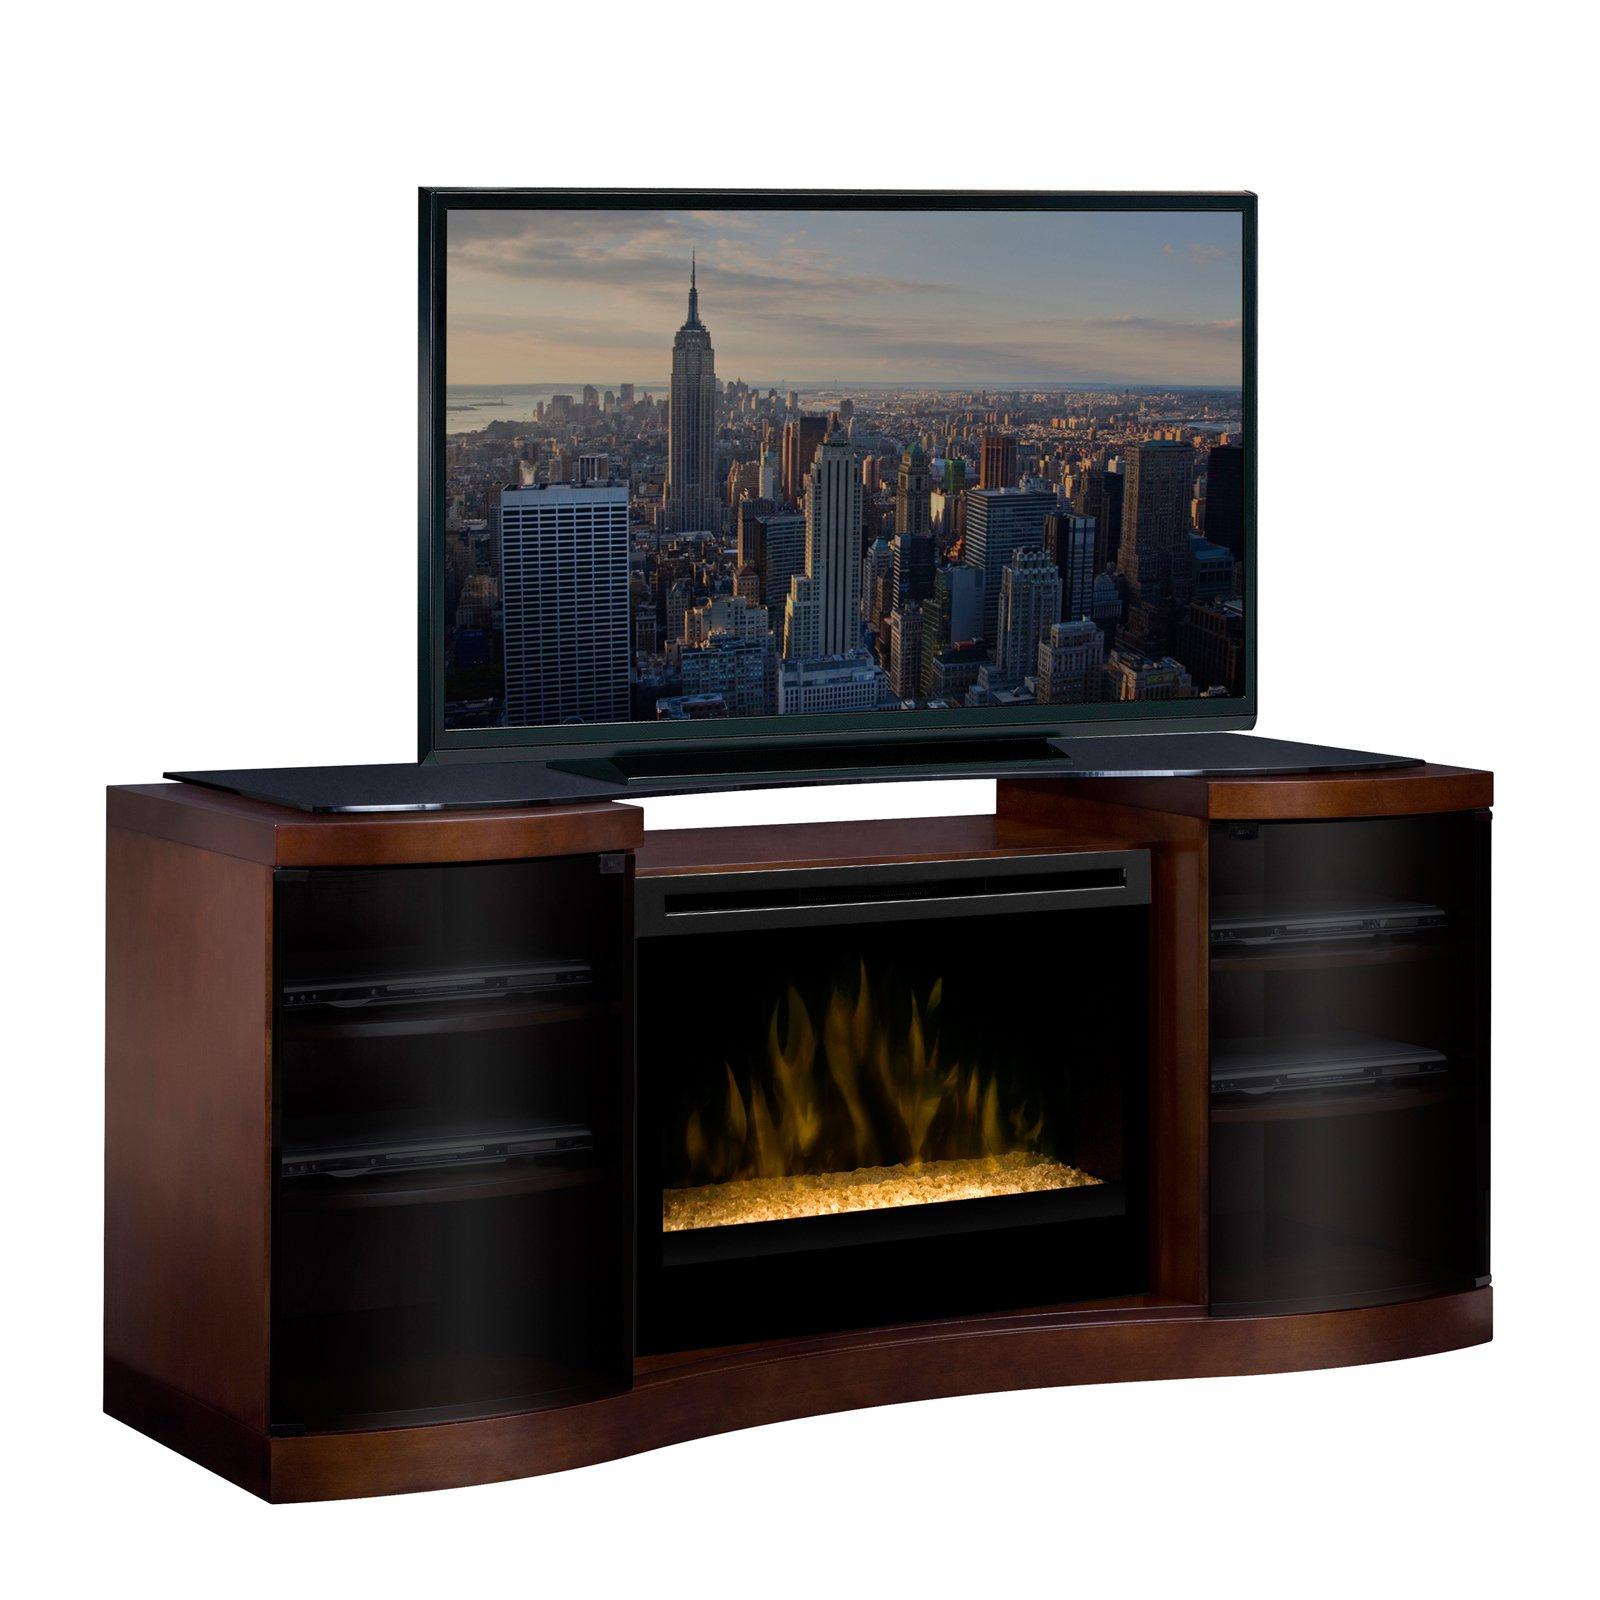 Tuckr Box Decors : Corner Tv (View 15 of 20)